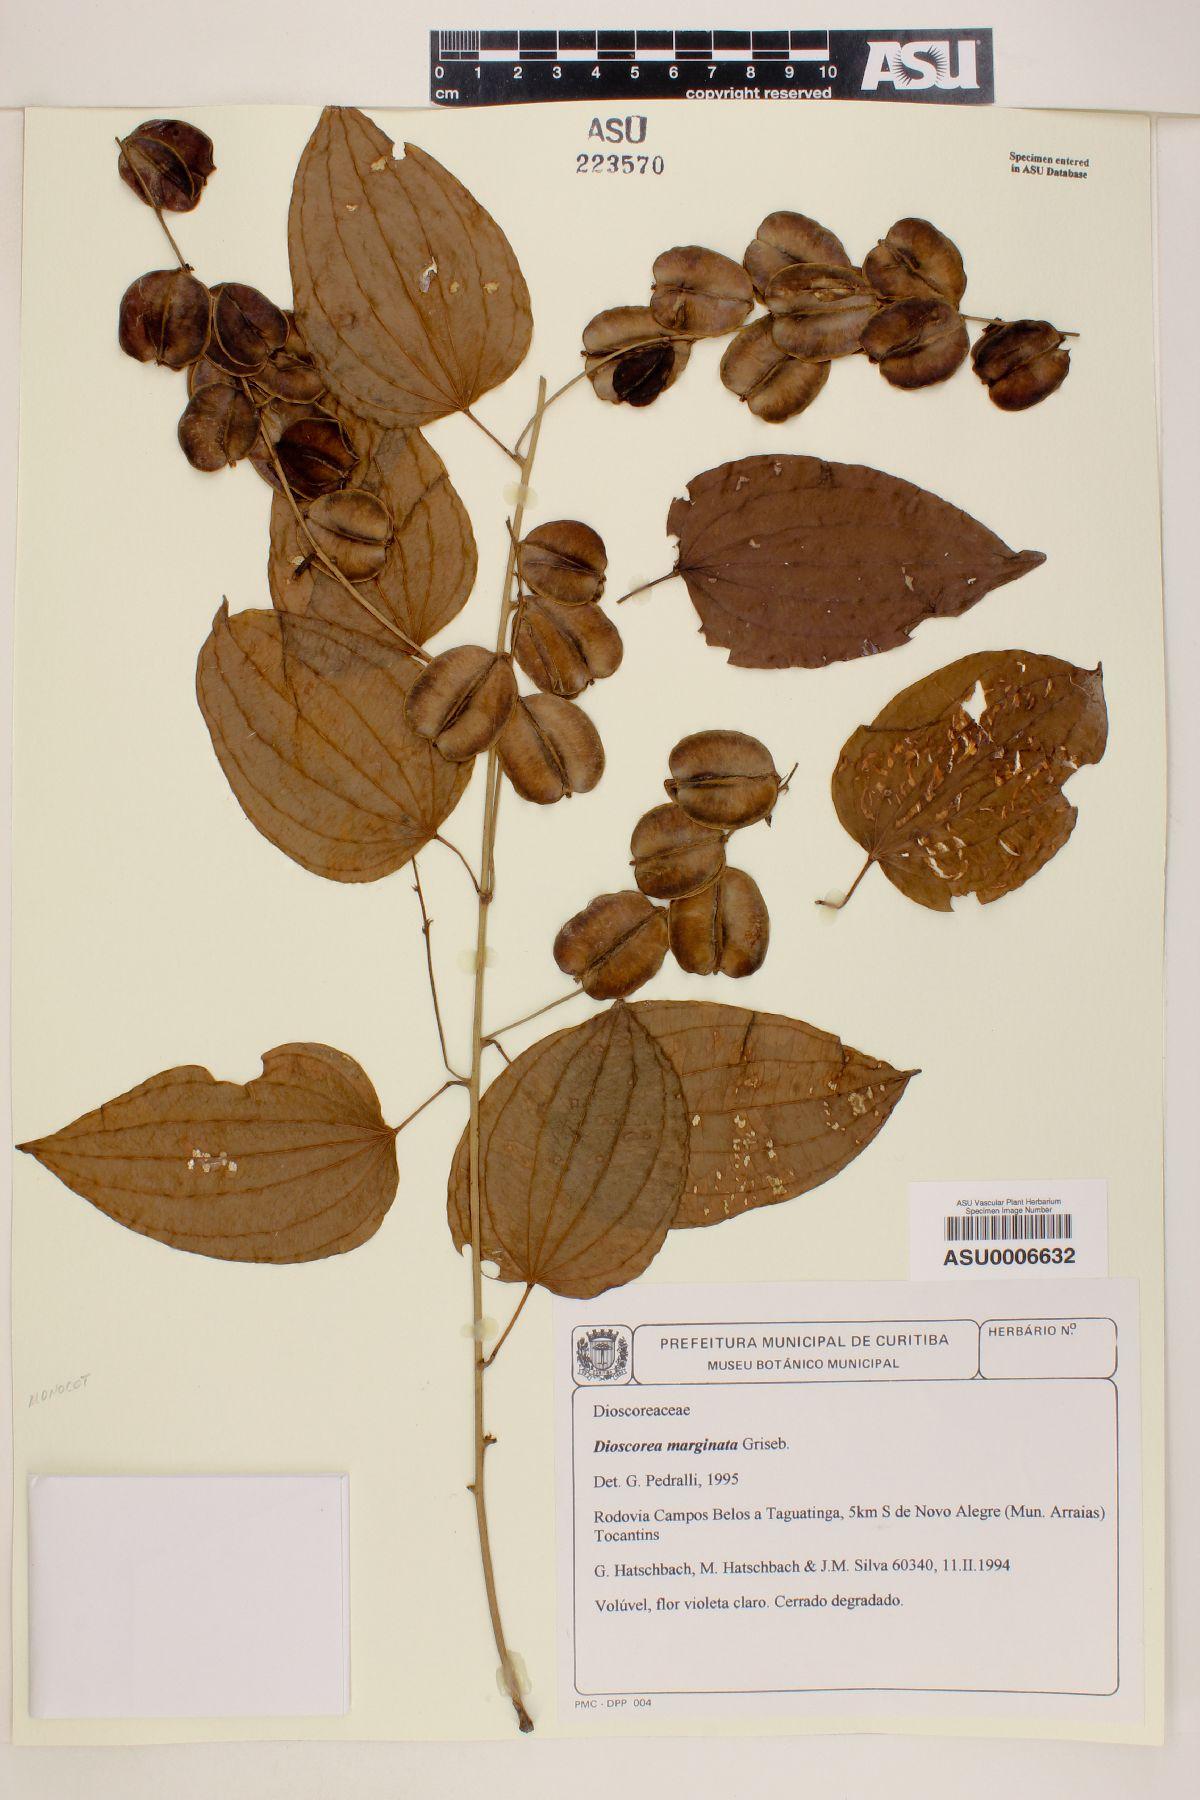 Dioscorea marginata image